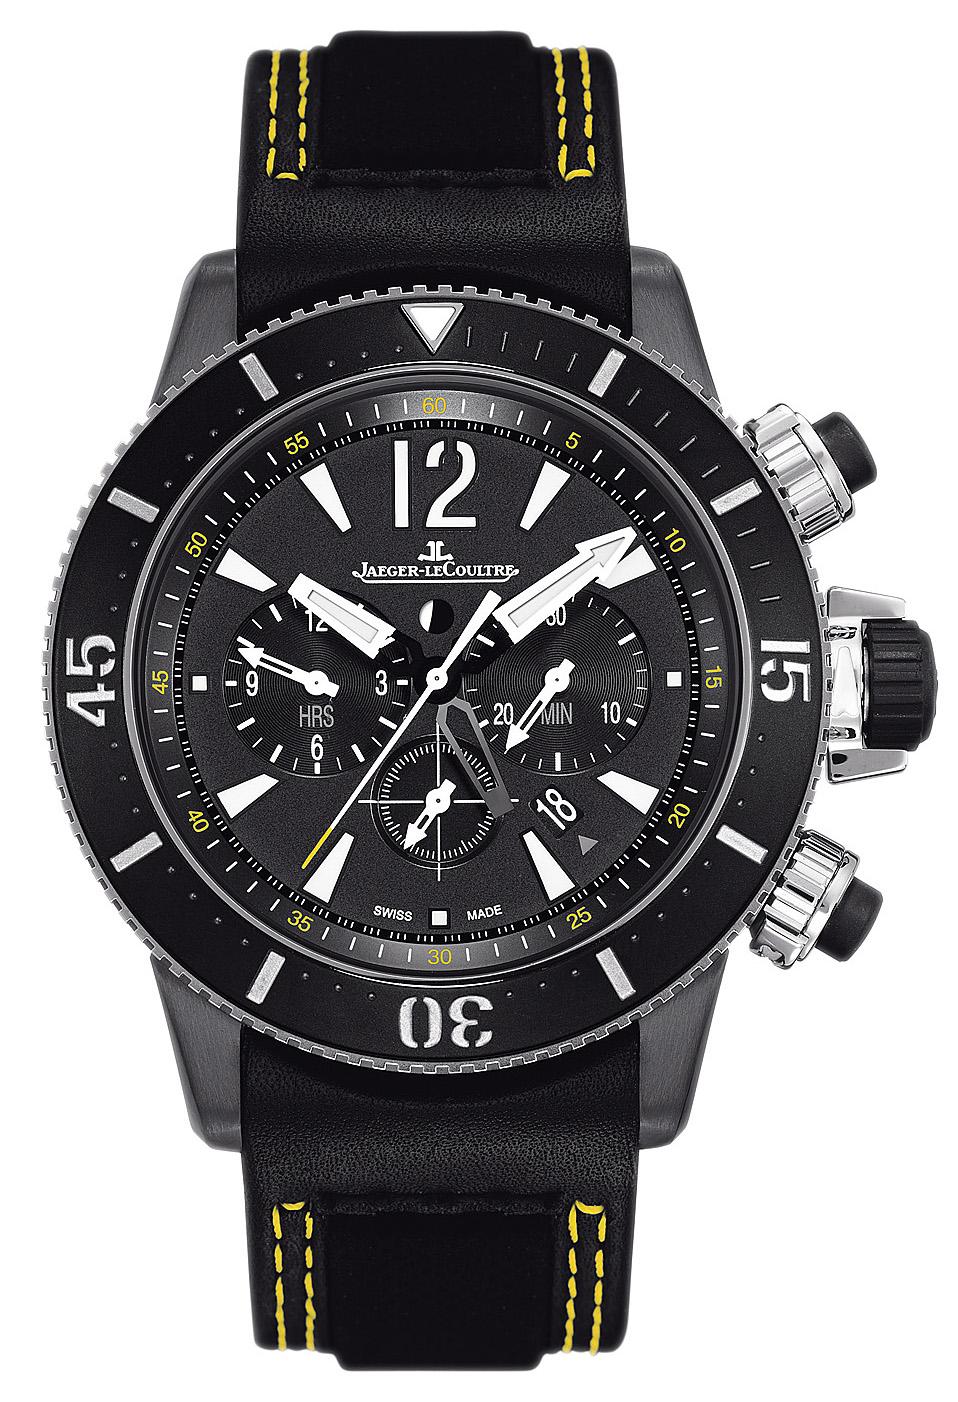 Часы Jaeger-LeCoultre Master Compressor Diving GMT Navy Seal's